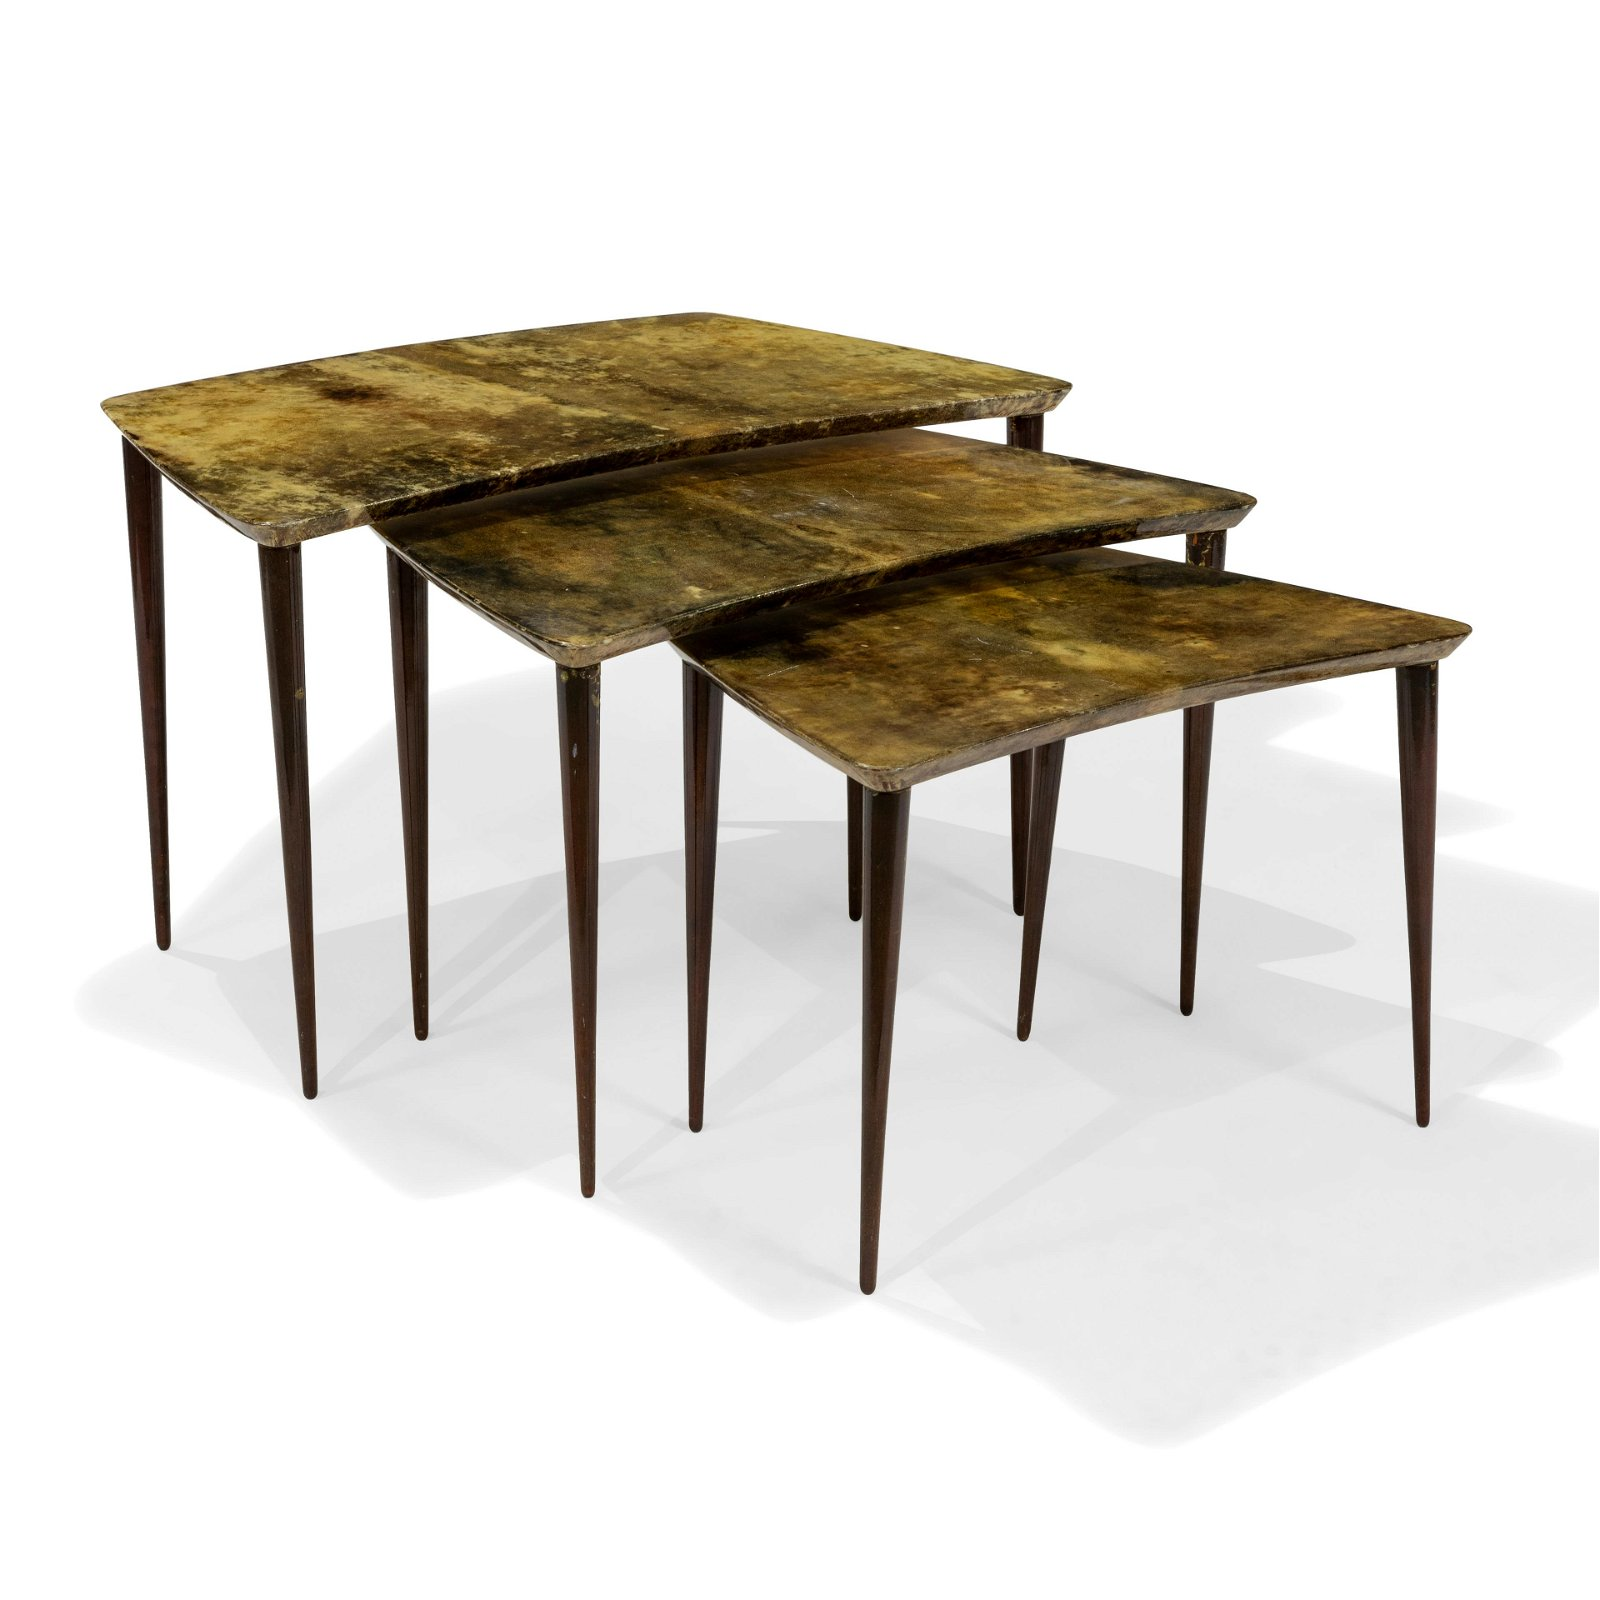 Aldo Tura - Goatskin Nesting Tables